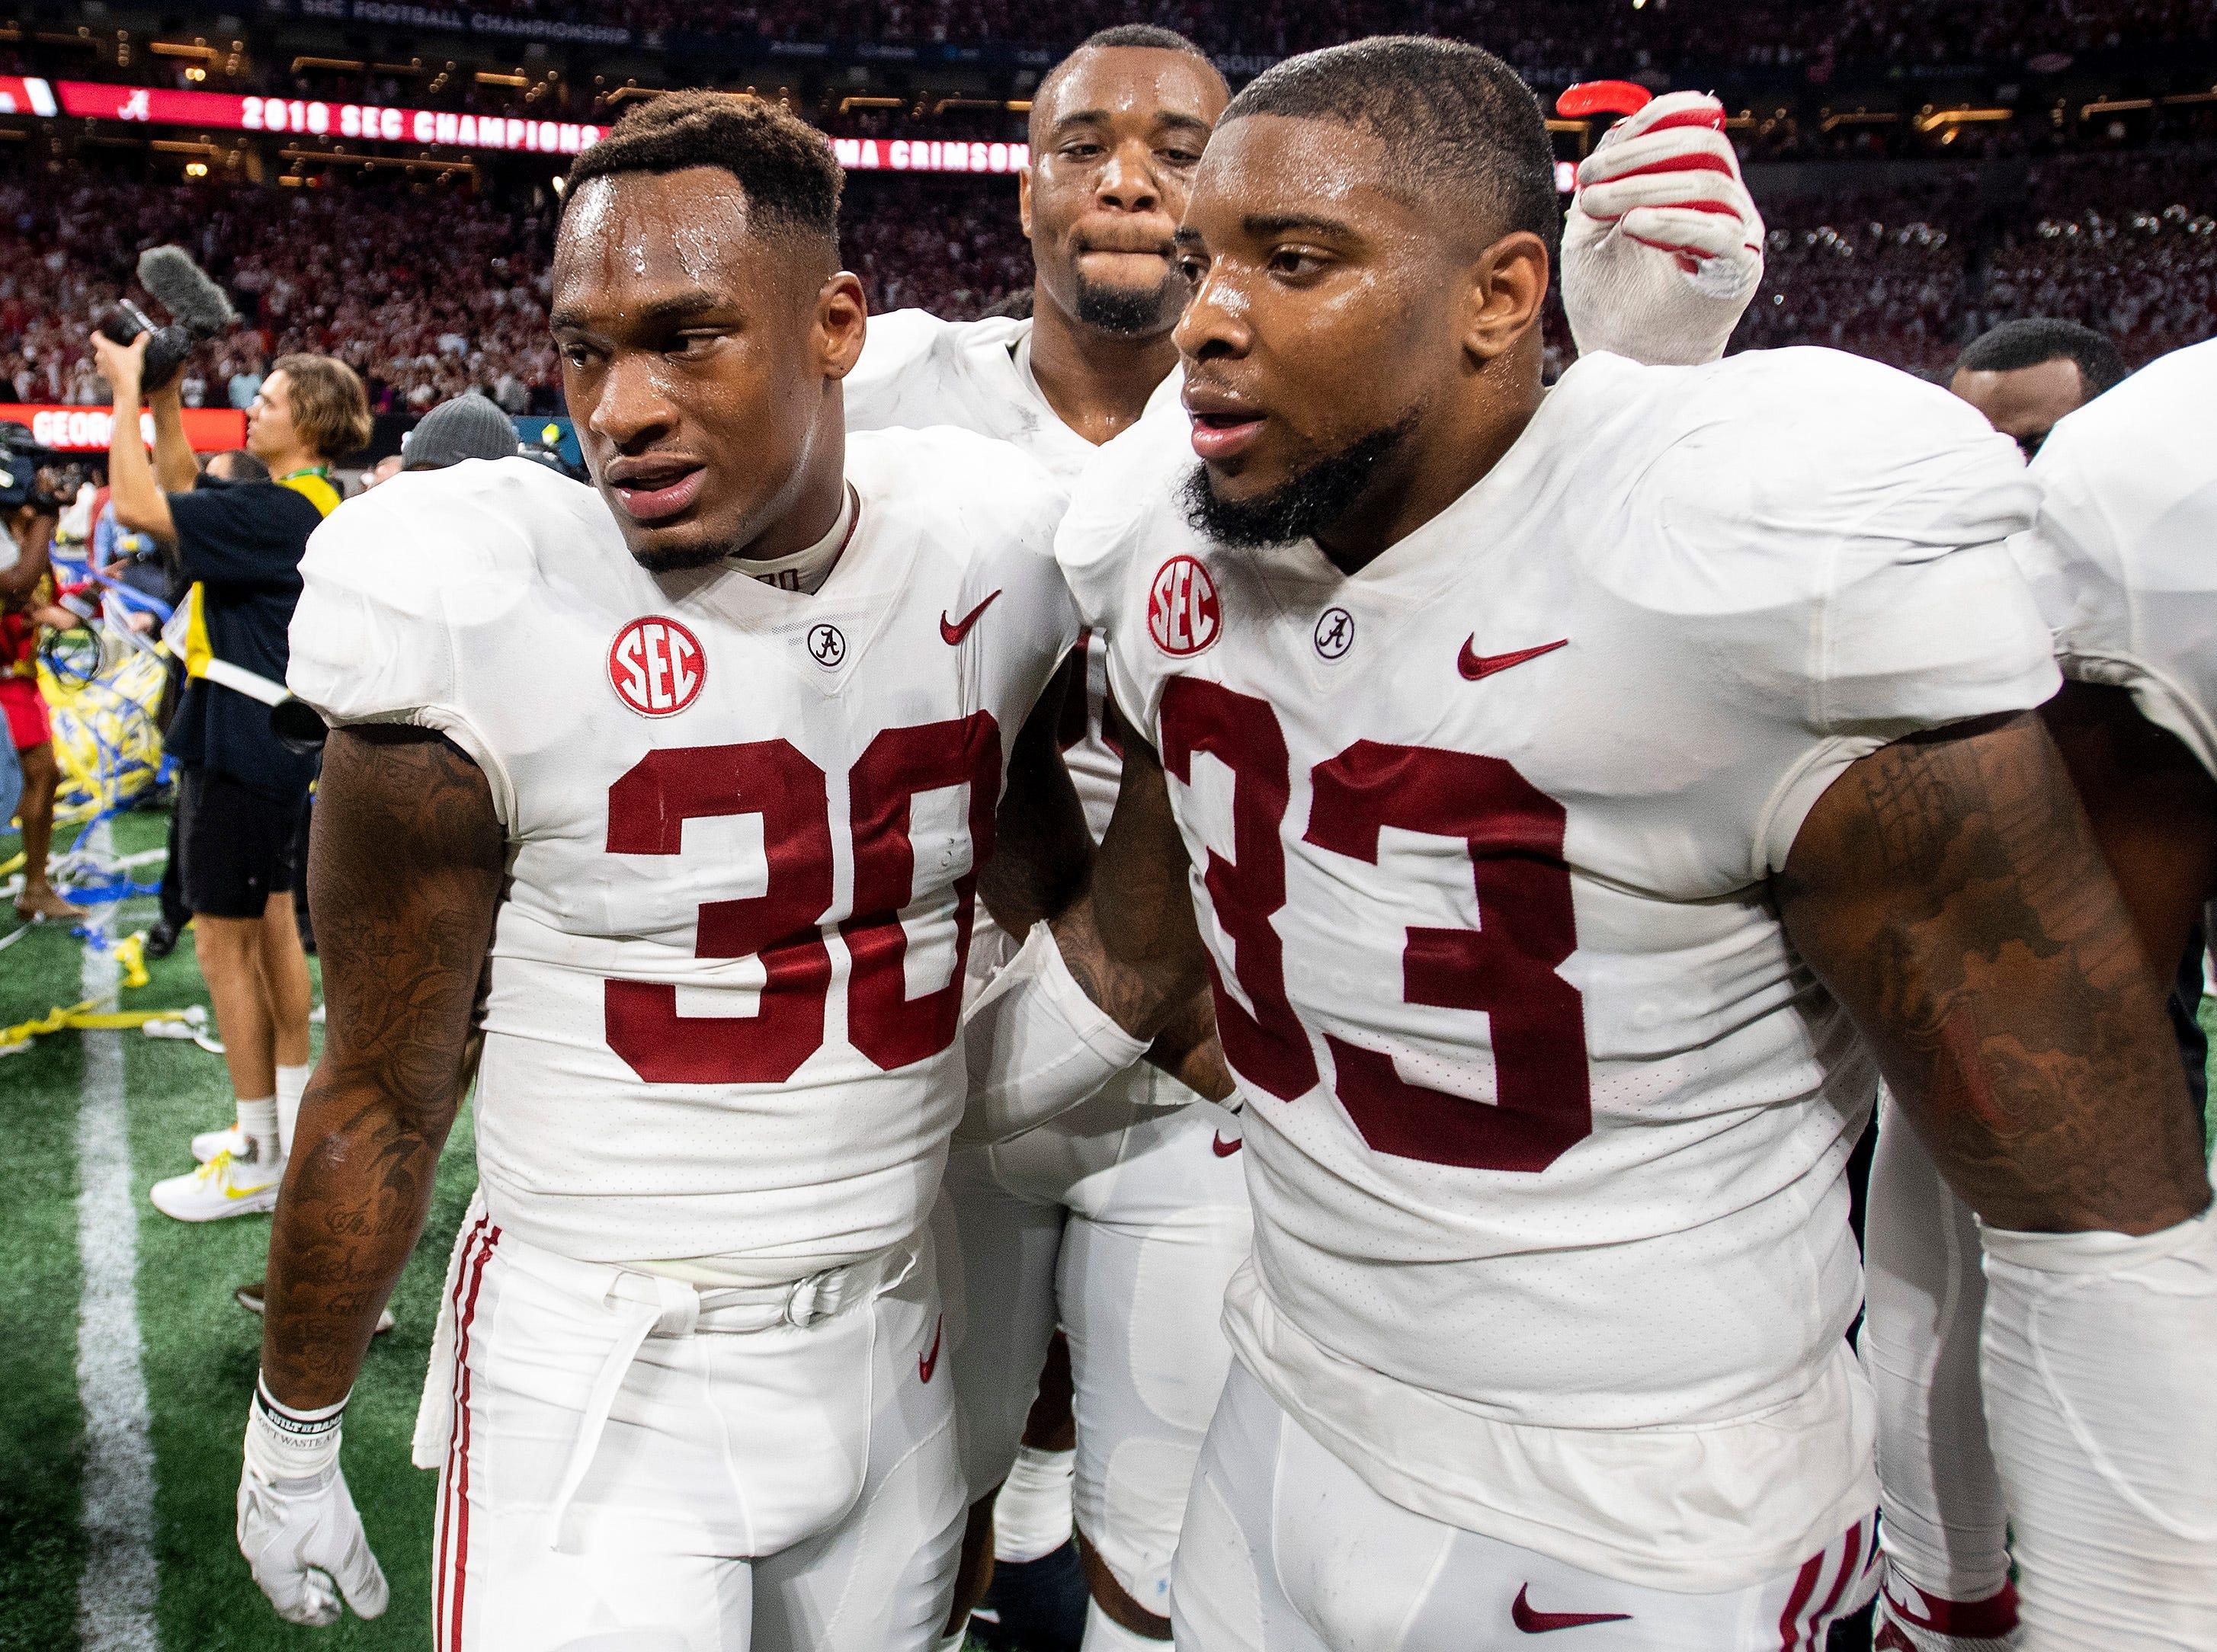 Alabama linebacker Mack Wilson (30), linebacker Anfernee Jennings (33) and defensive lineman Raekwon Davis (99) after winning the SEC Championship Game at Mercedes Benz Stadium in Atlanta, Ga., on Saturday December 1, 2018.